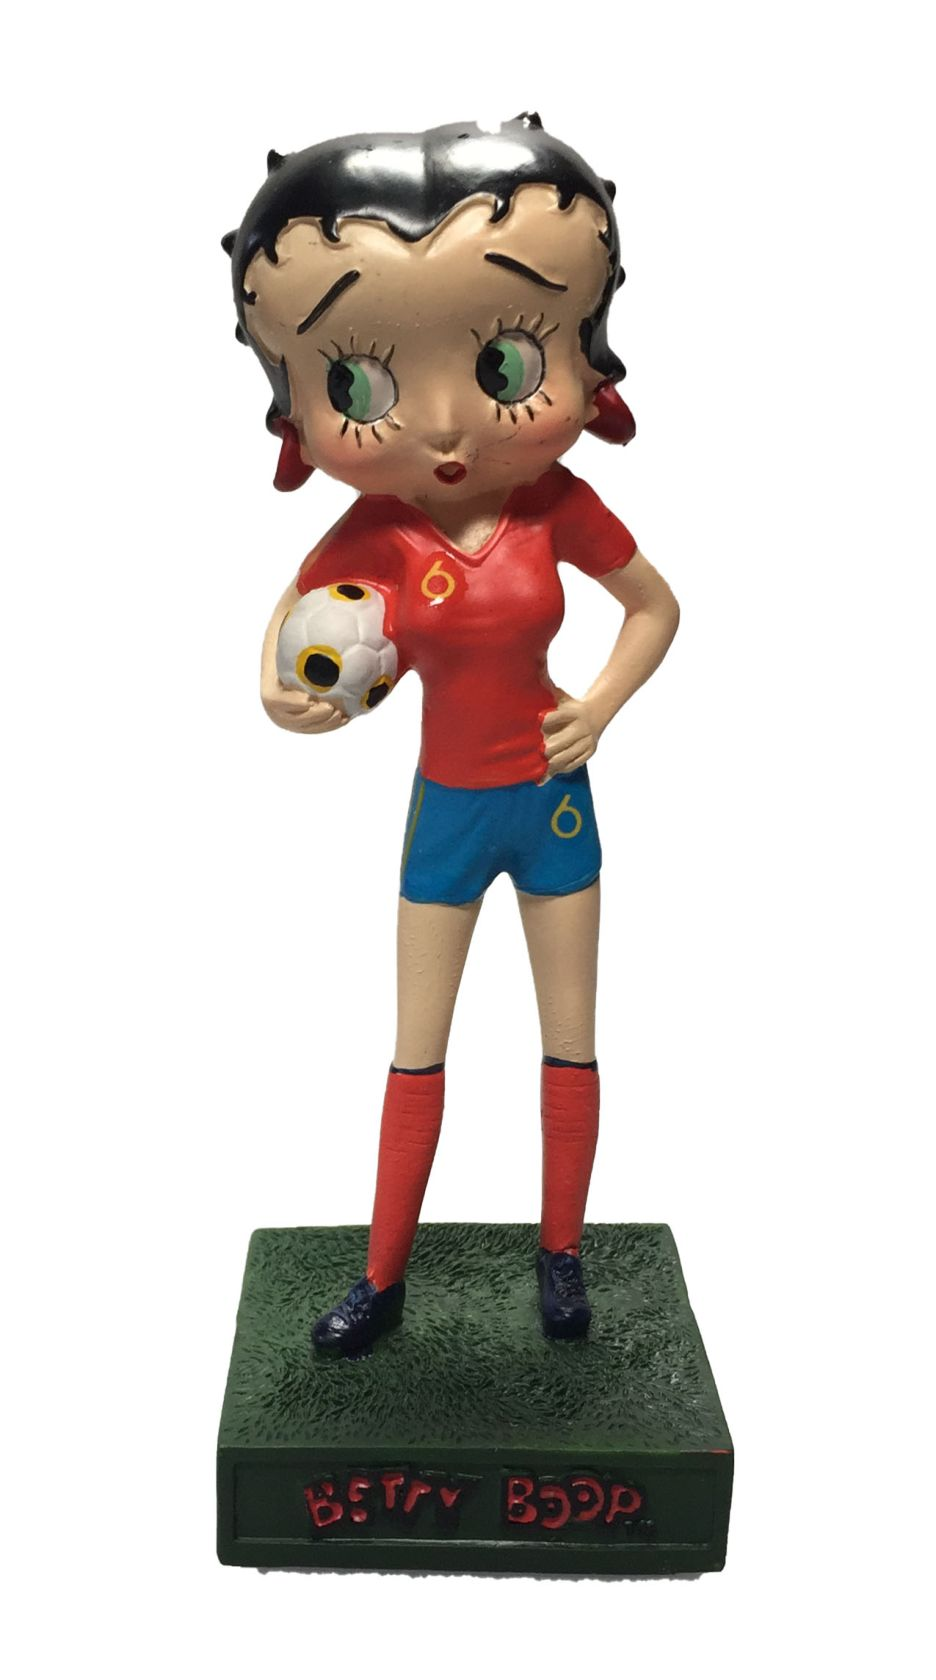 Betty Boop Footballeuse - Équipe d'Espagne-0